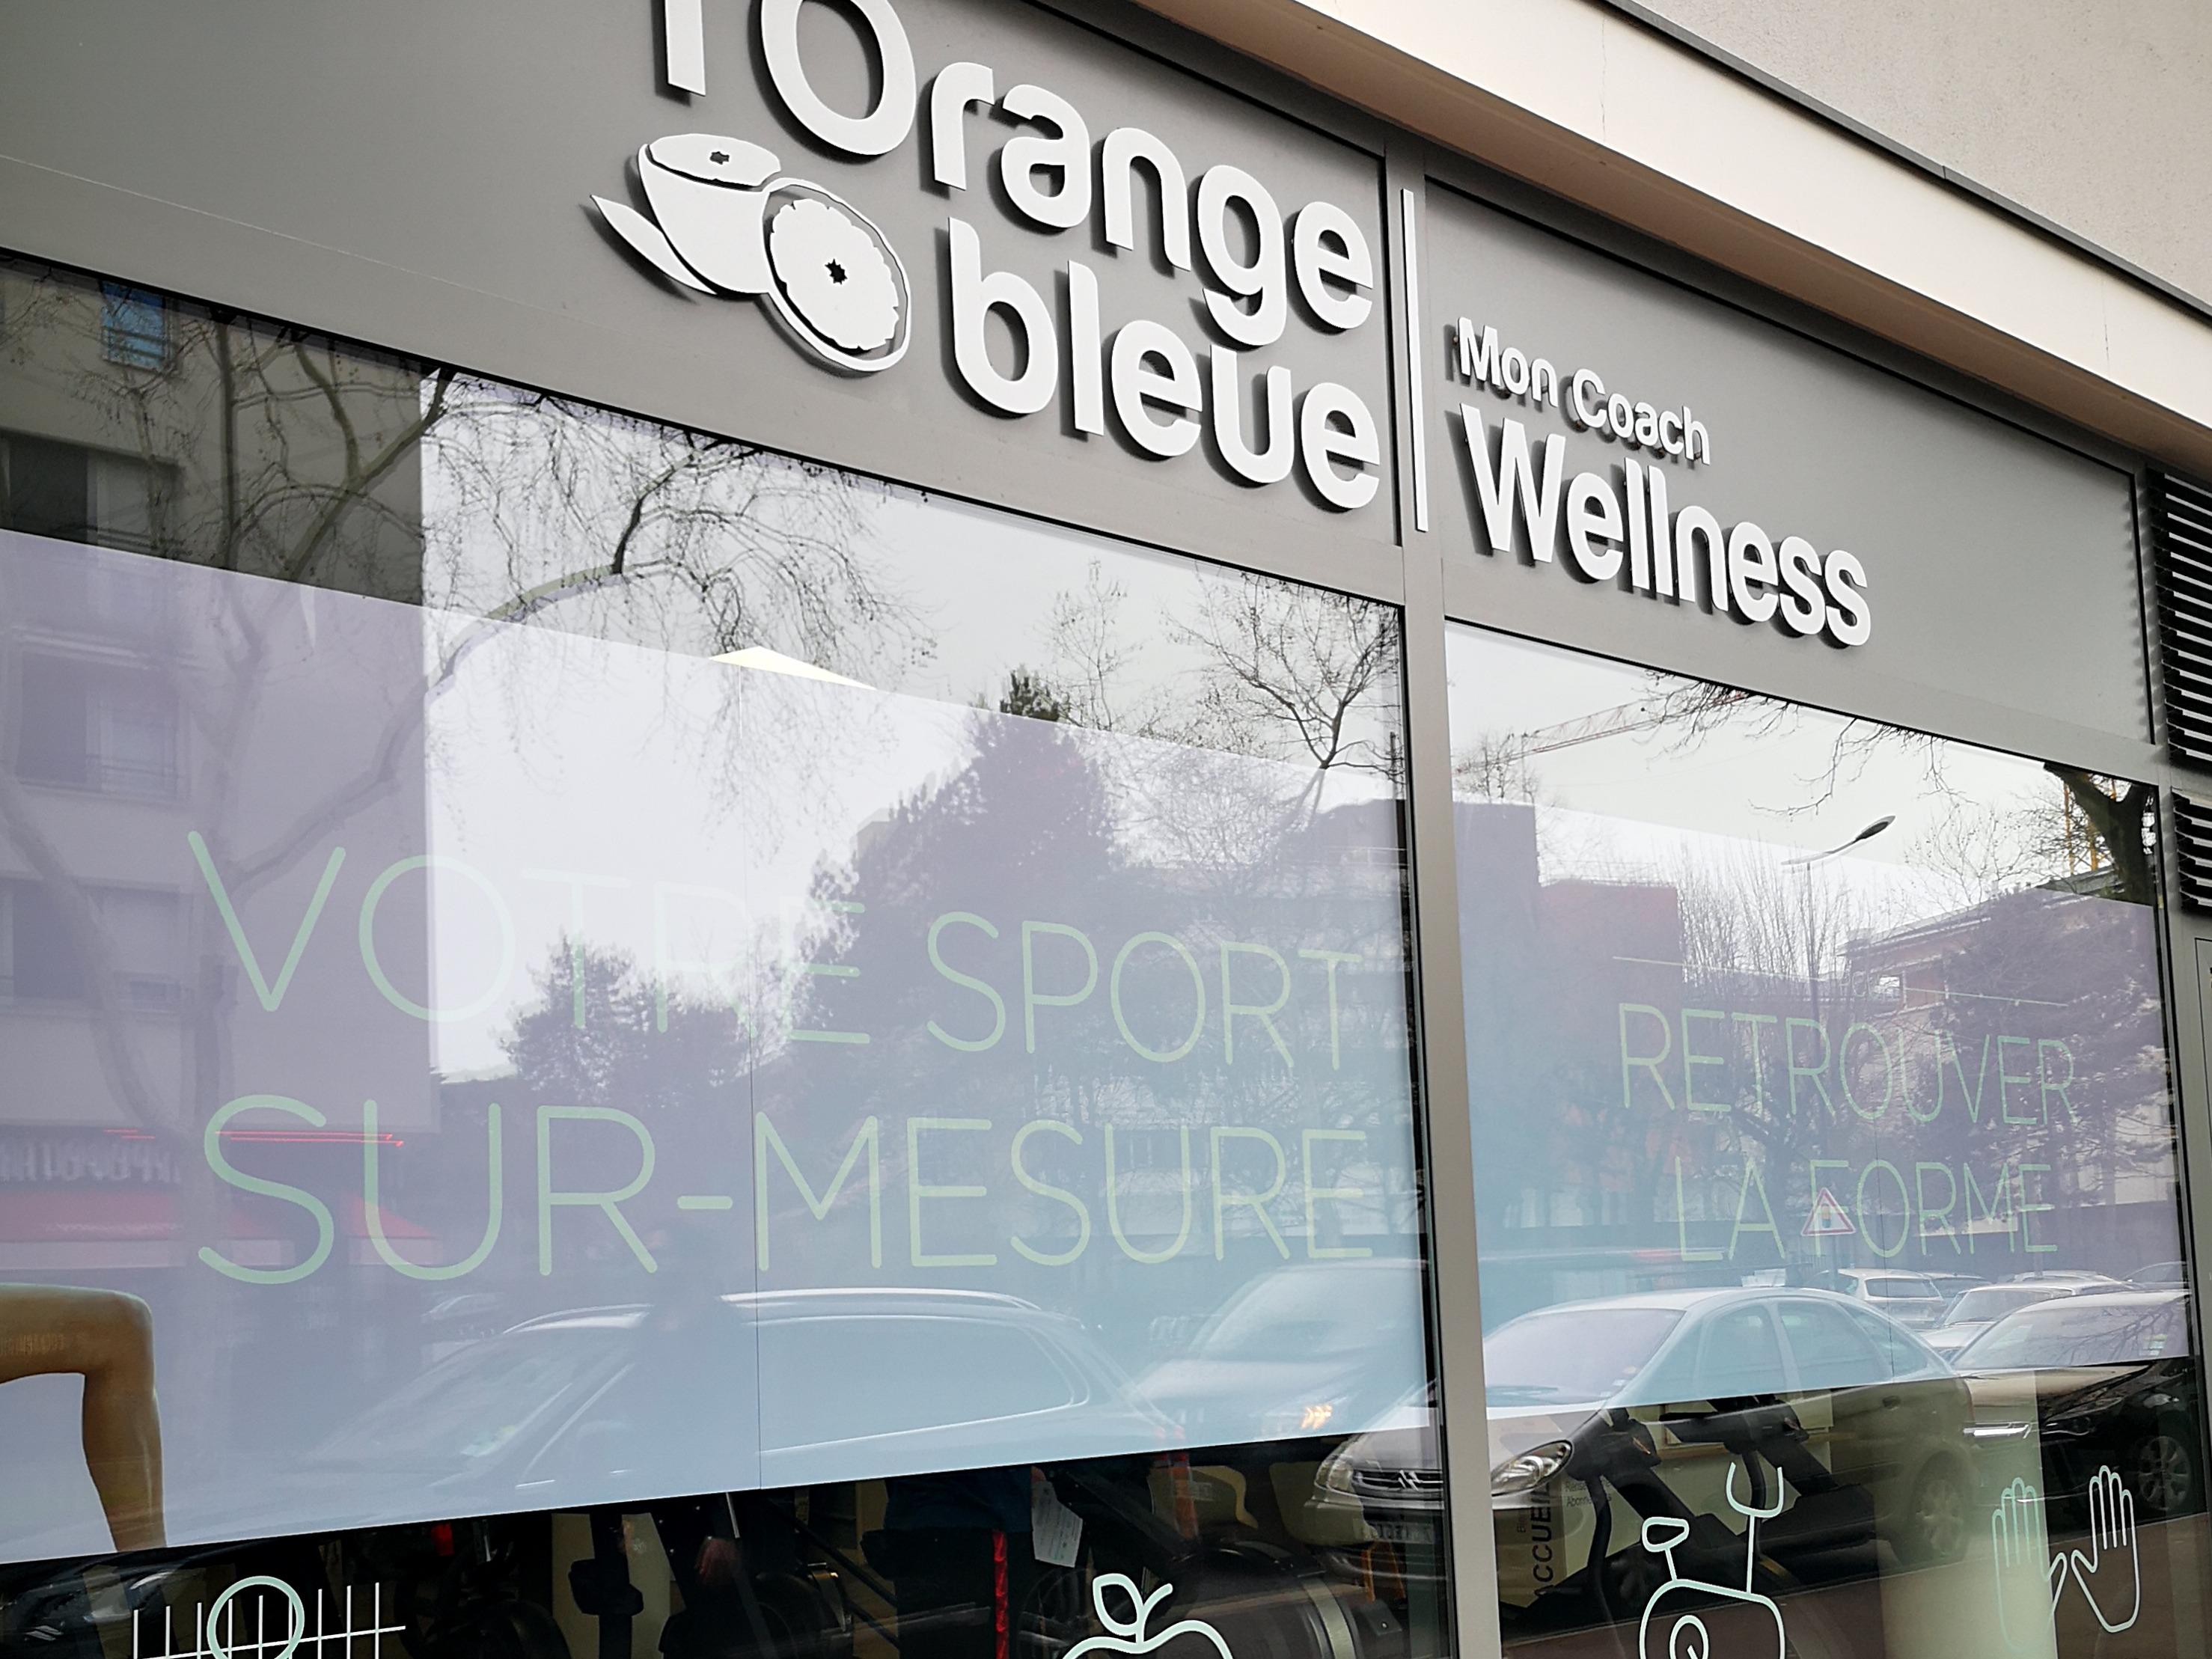 L'Orange Bleue Wellness Rueil-Malmaison-0